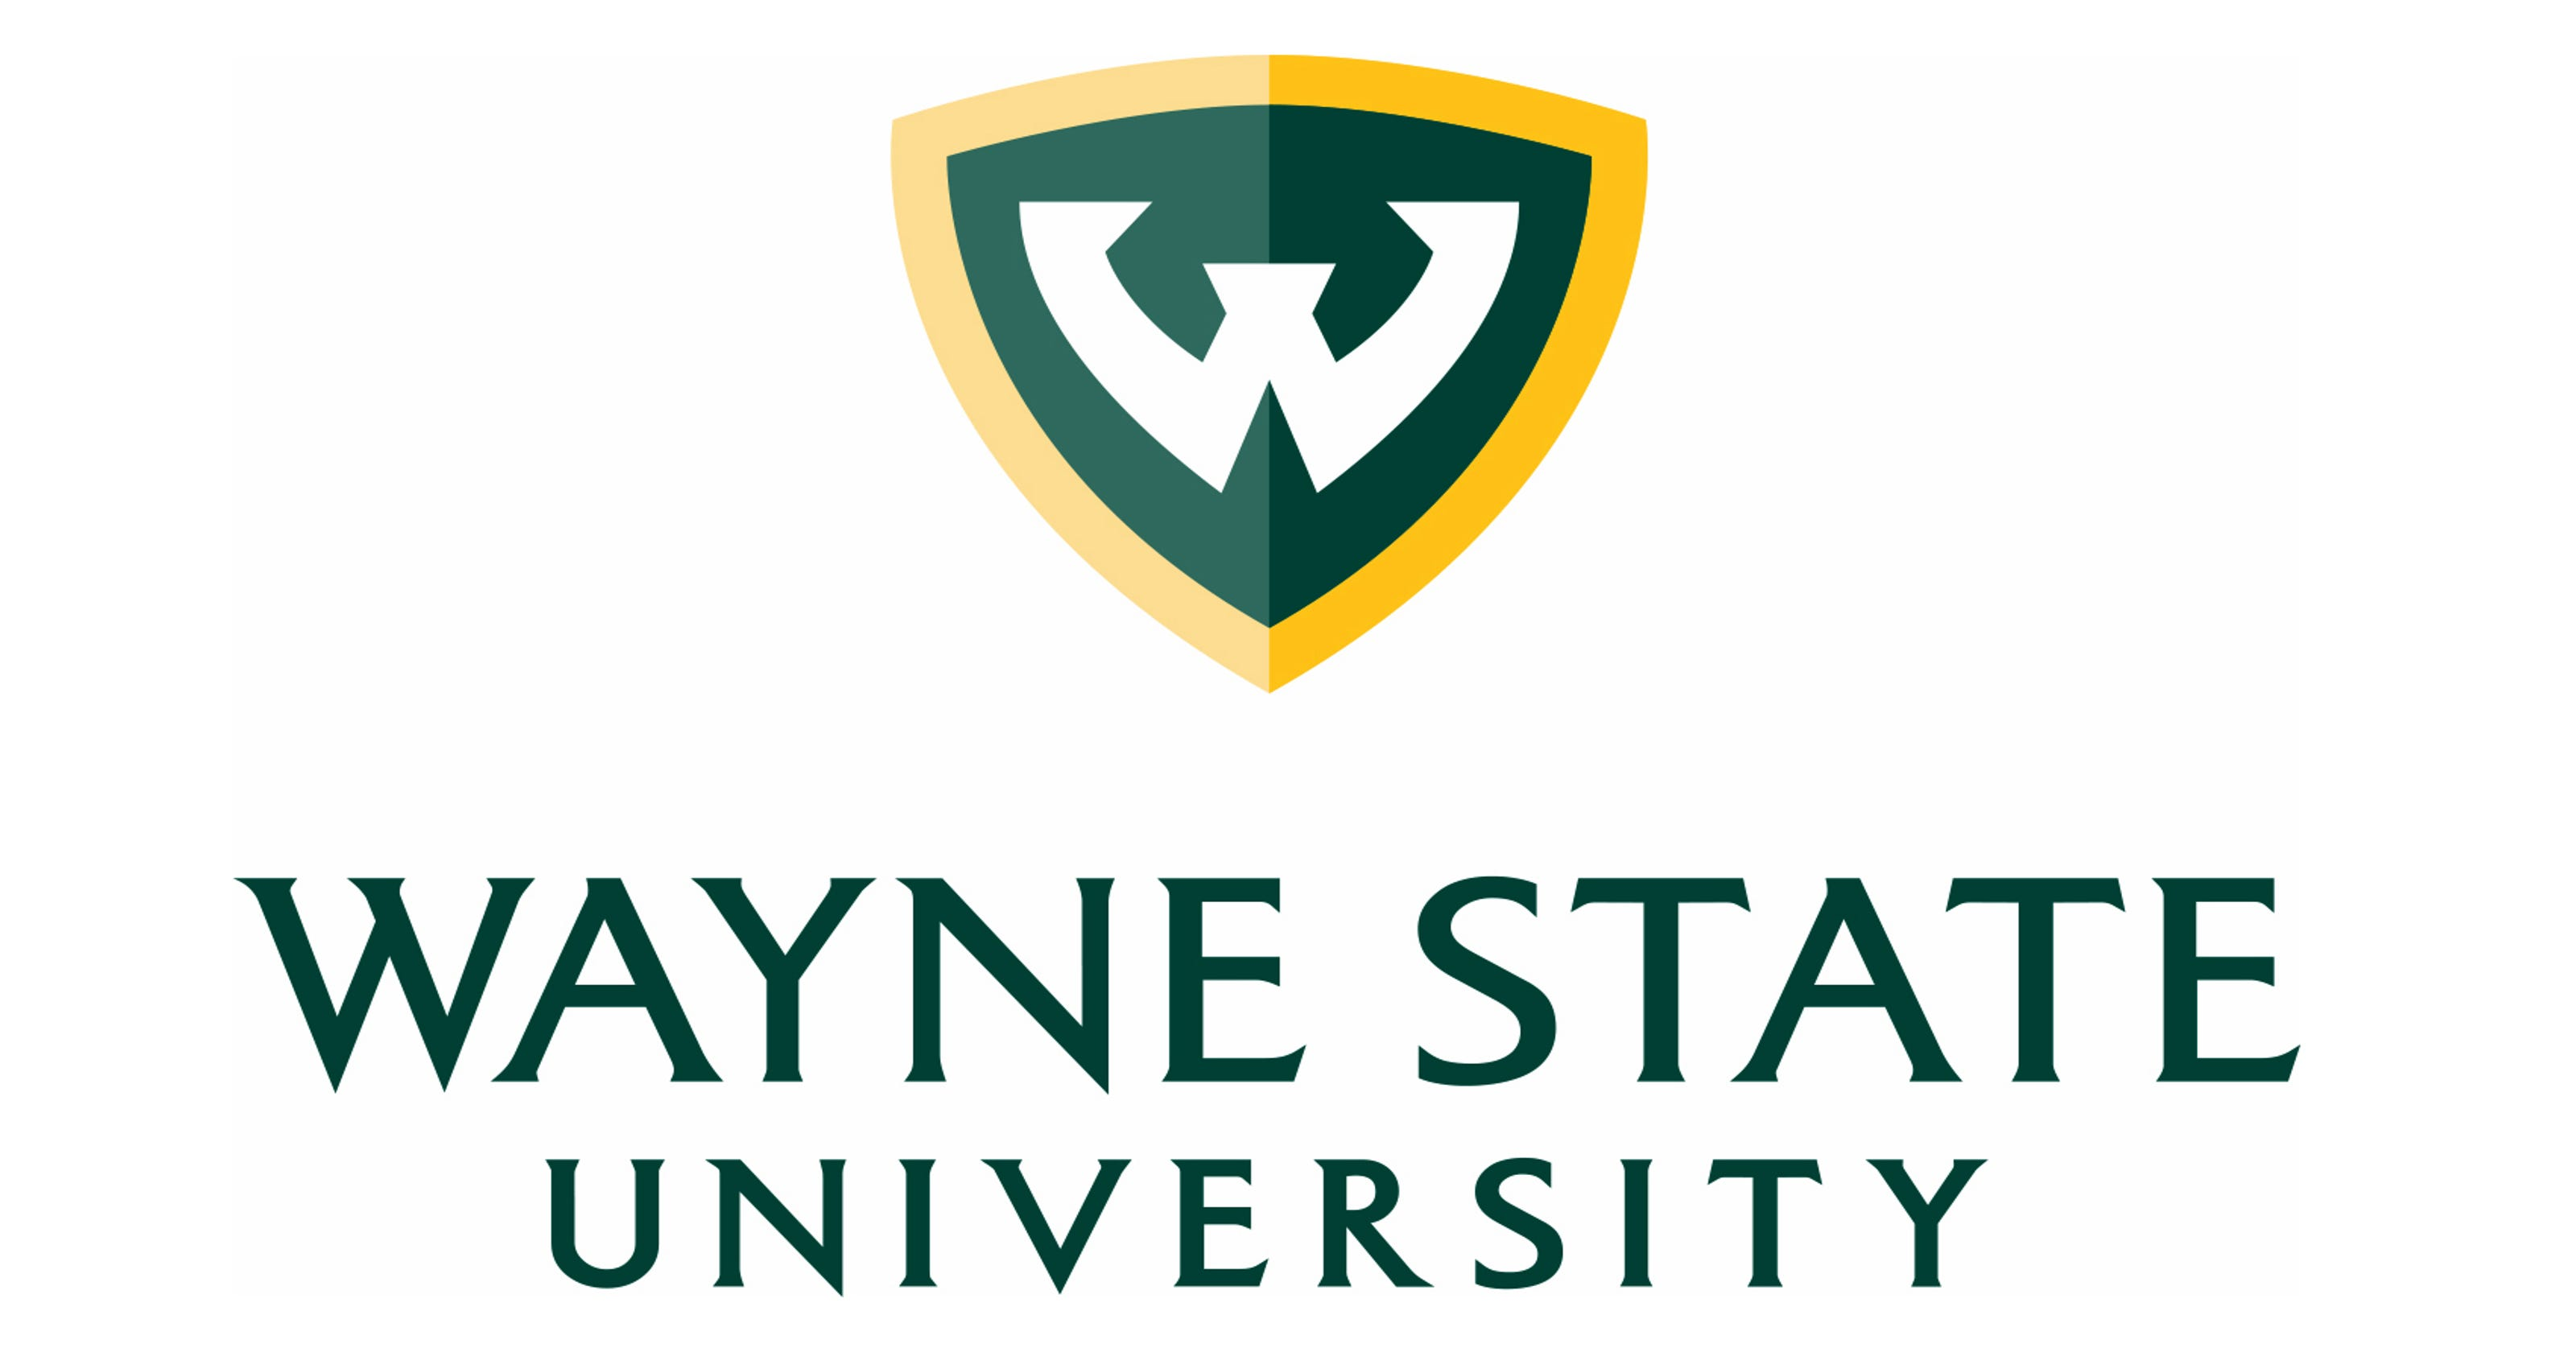 wayne state unveils new logo marketing slogan